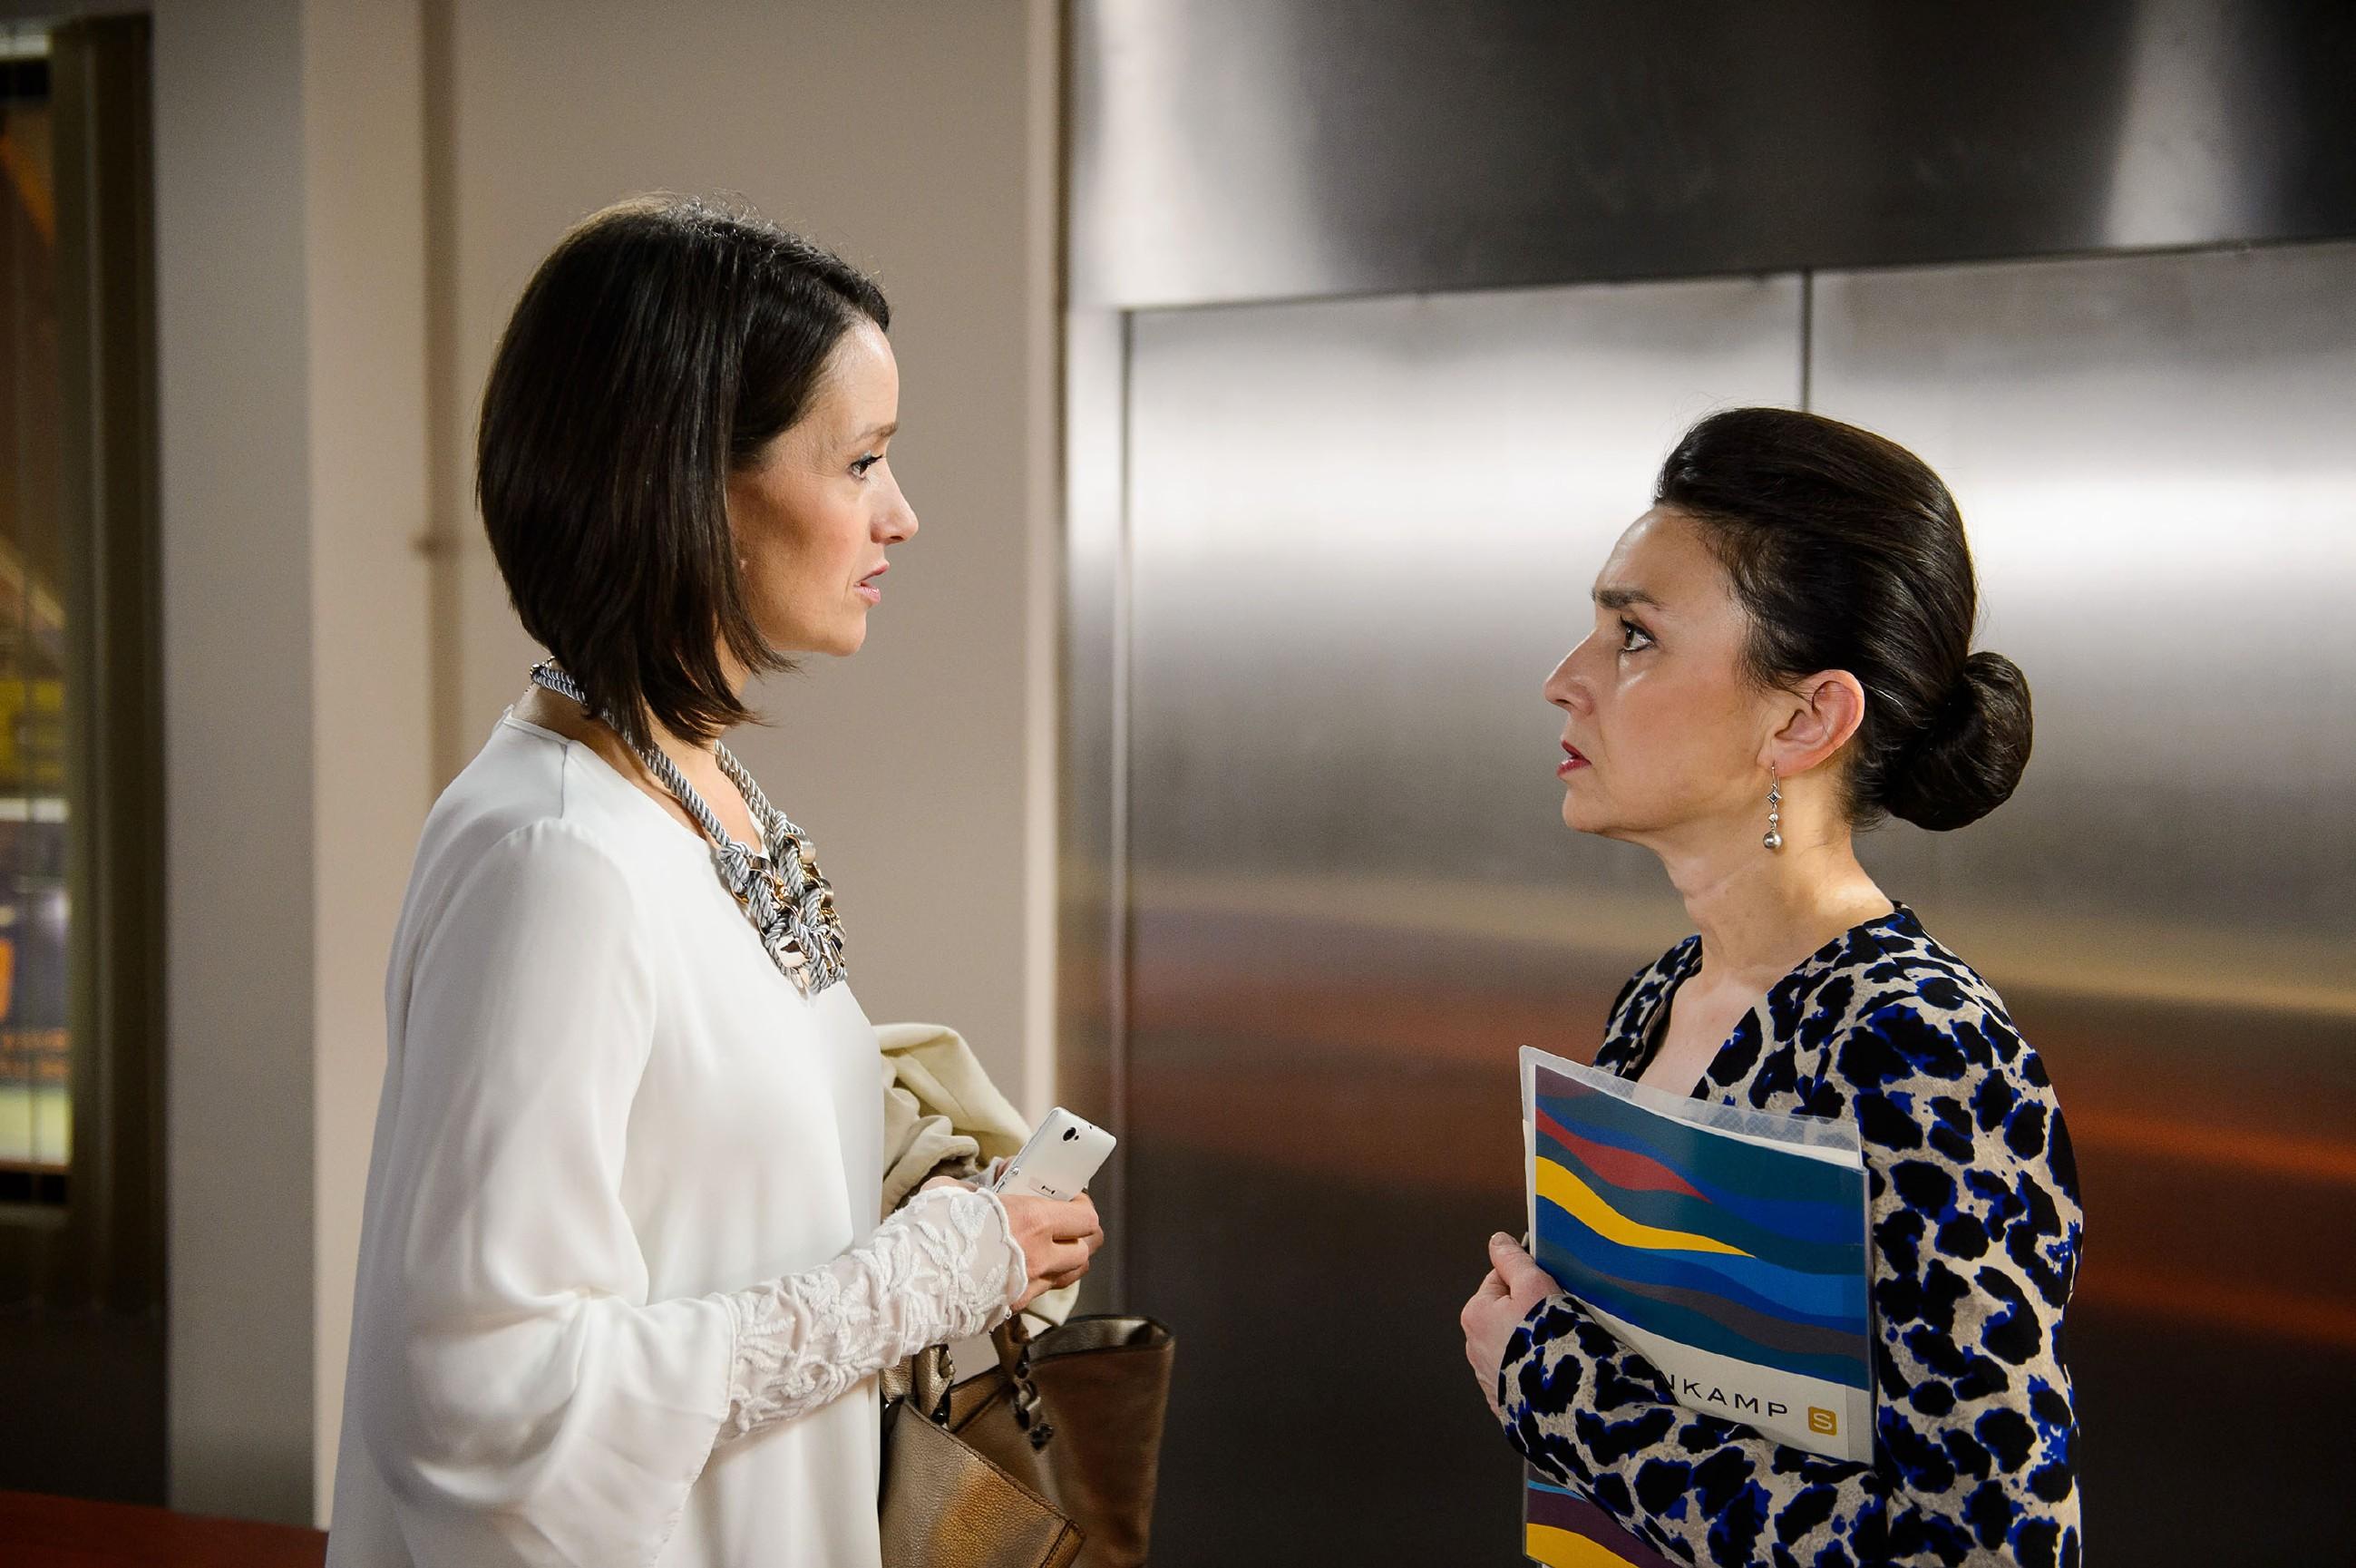 Jenny (Kaja Schmidt-Tychsen, l.) gerät wegen Maries unprofessionellem Verhalten vor Simone (Tatjana Clasing) unter Druck. (Quelle: RTL / Willi Weber)